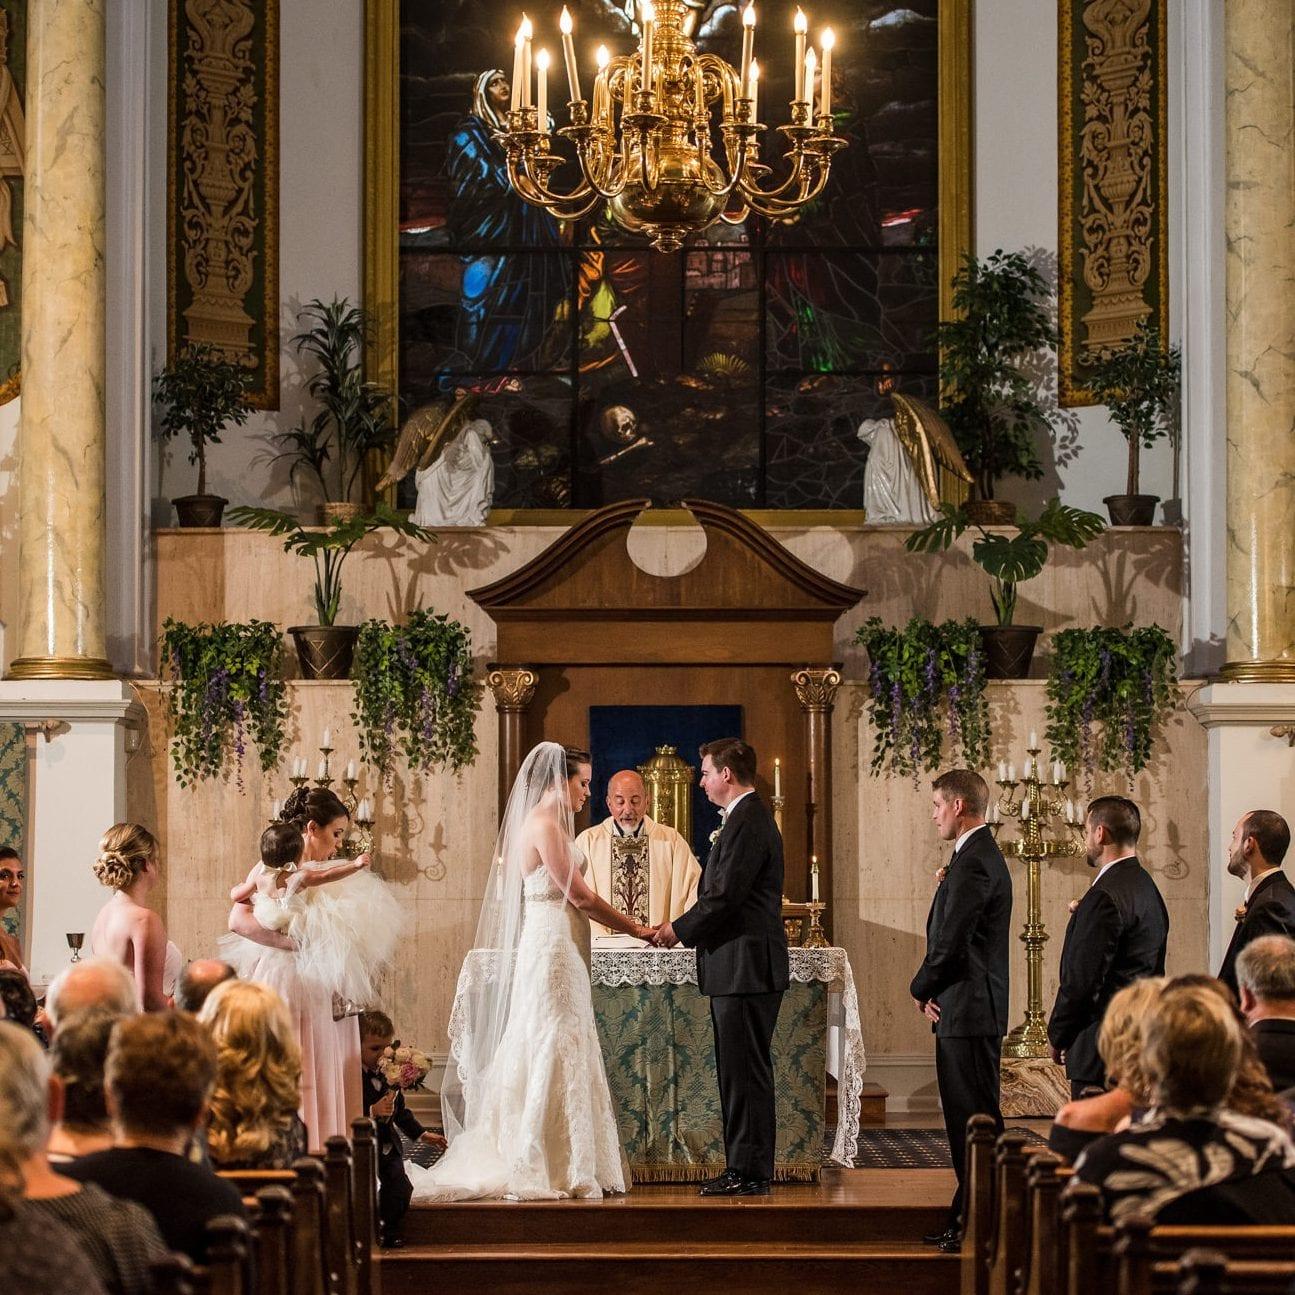 Church Ceremony e1586020550882